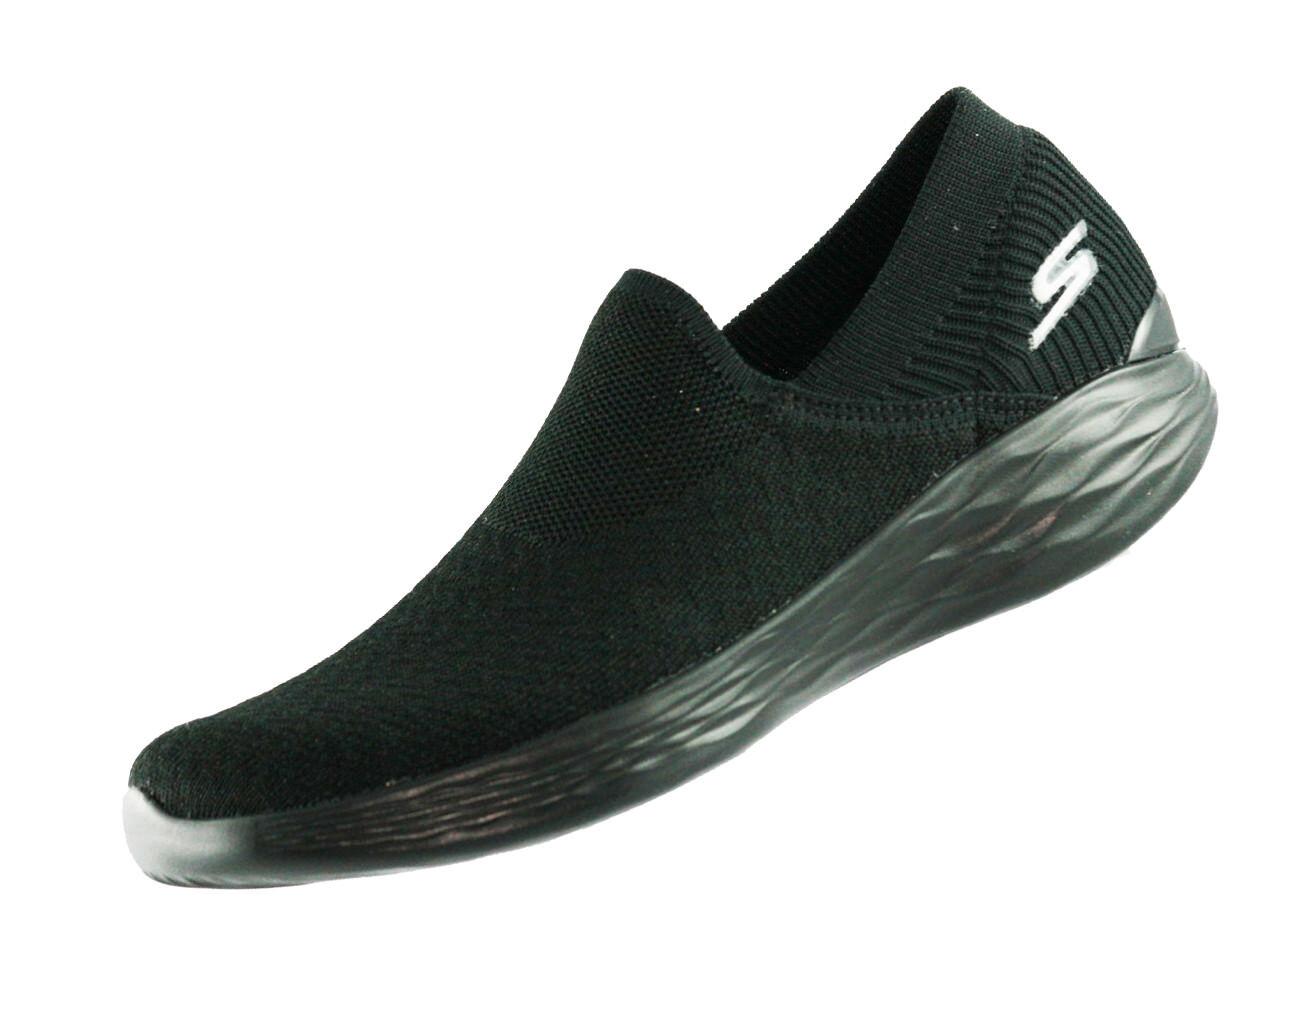 Zapatos promocionales para hombres y mujeres You by Skechers Transcend 14959 BBK Damen Goga Max Sportschuhe Turnschuhe Neu